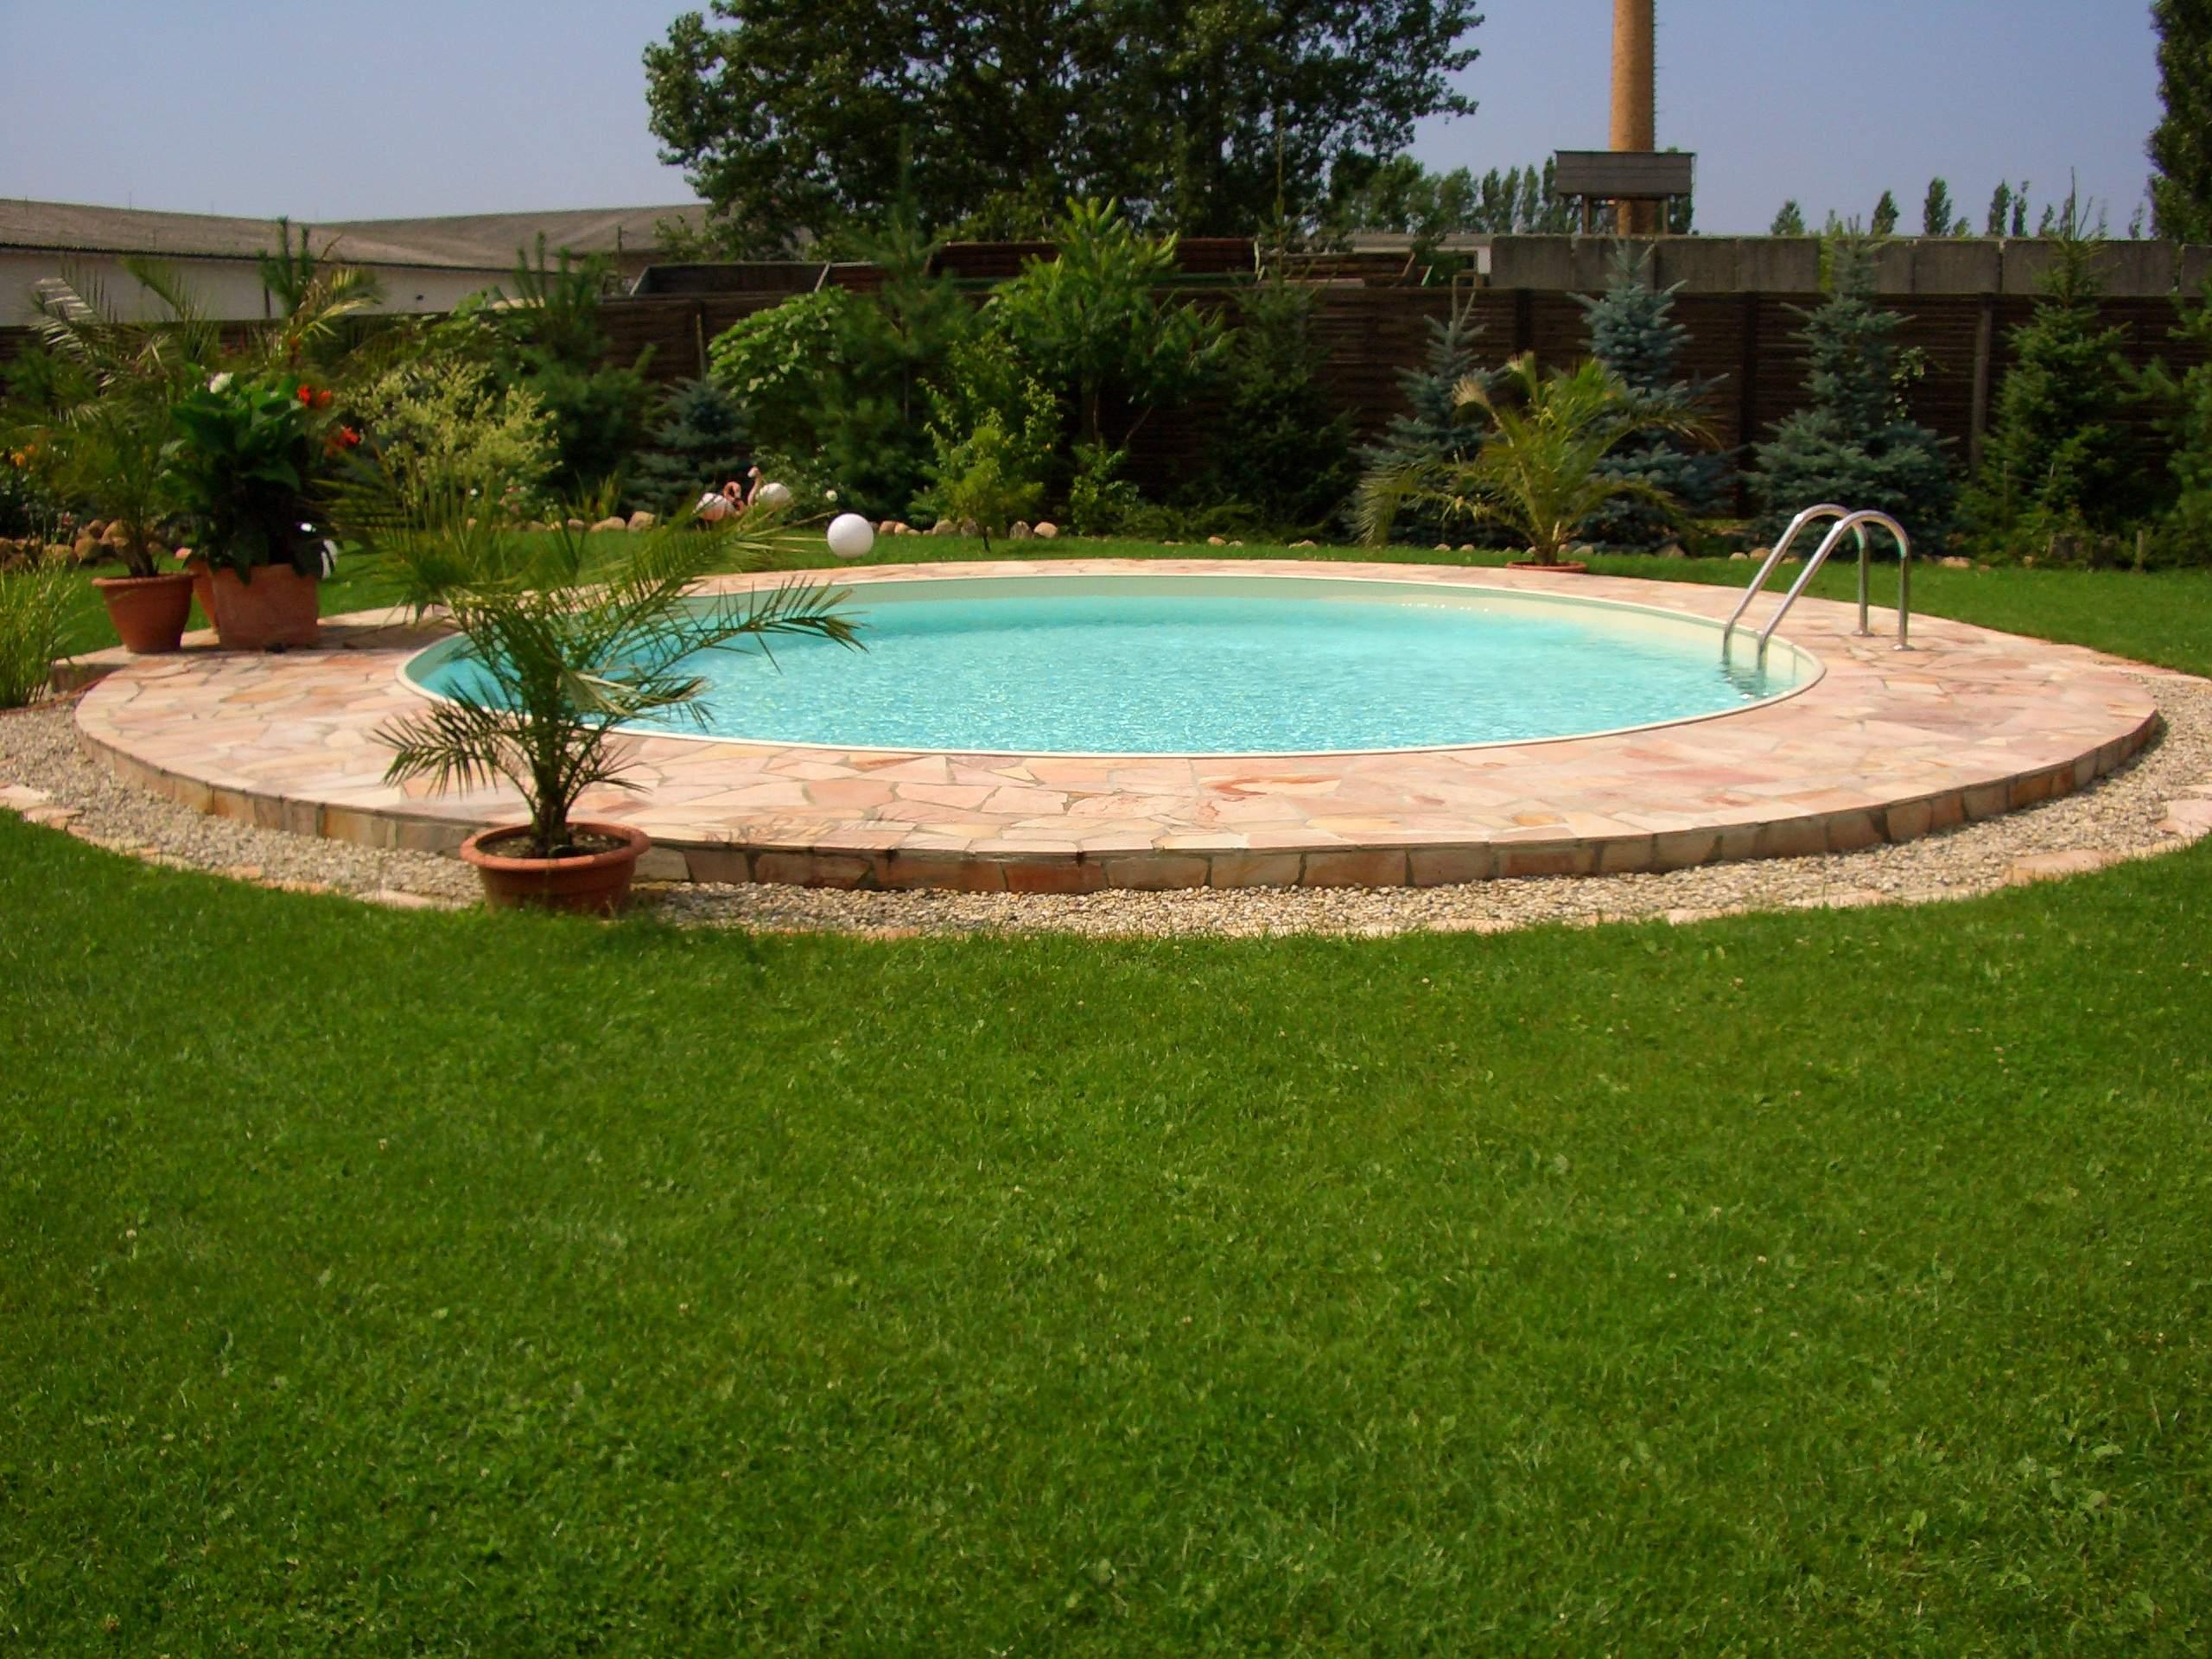 Sandfarb Pool